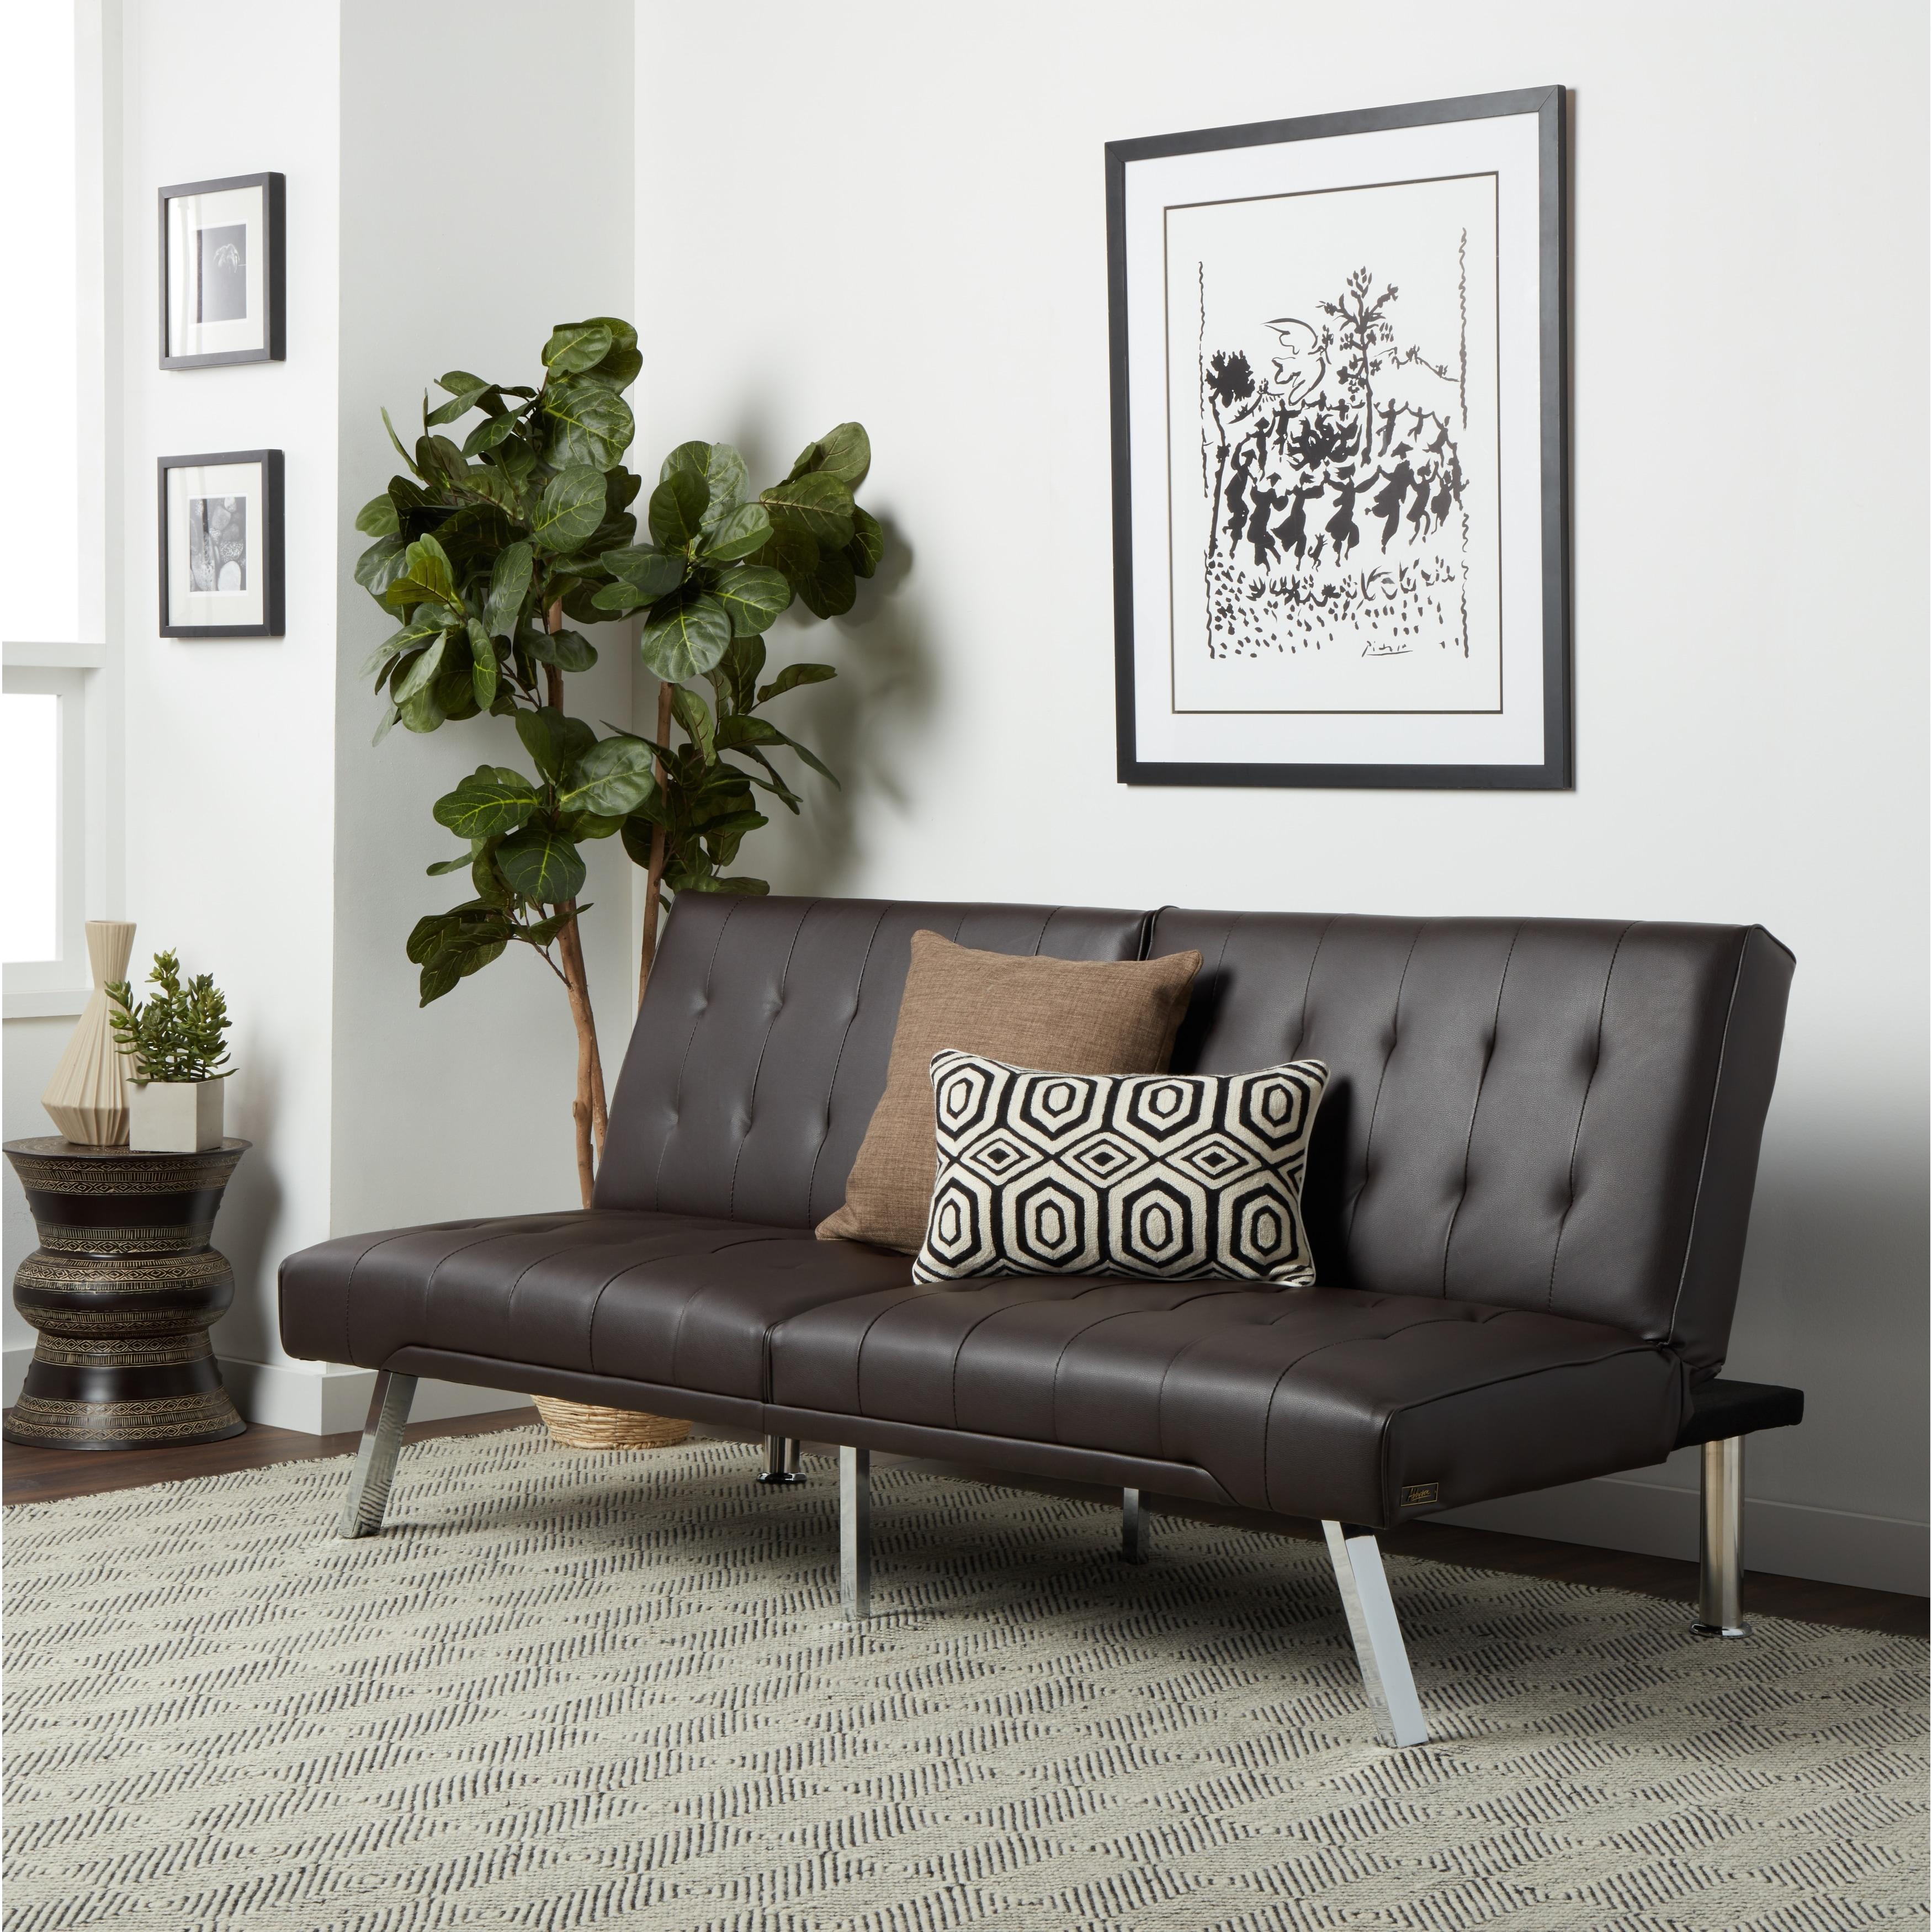 Brilliant Abbyson Jackson Dark Brown Leather Foldable Futon Sofa Bed Ibusinesslaw Wood Chair Design Ideas Ibusinesslaworg